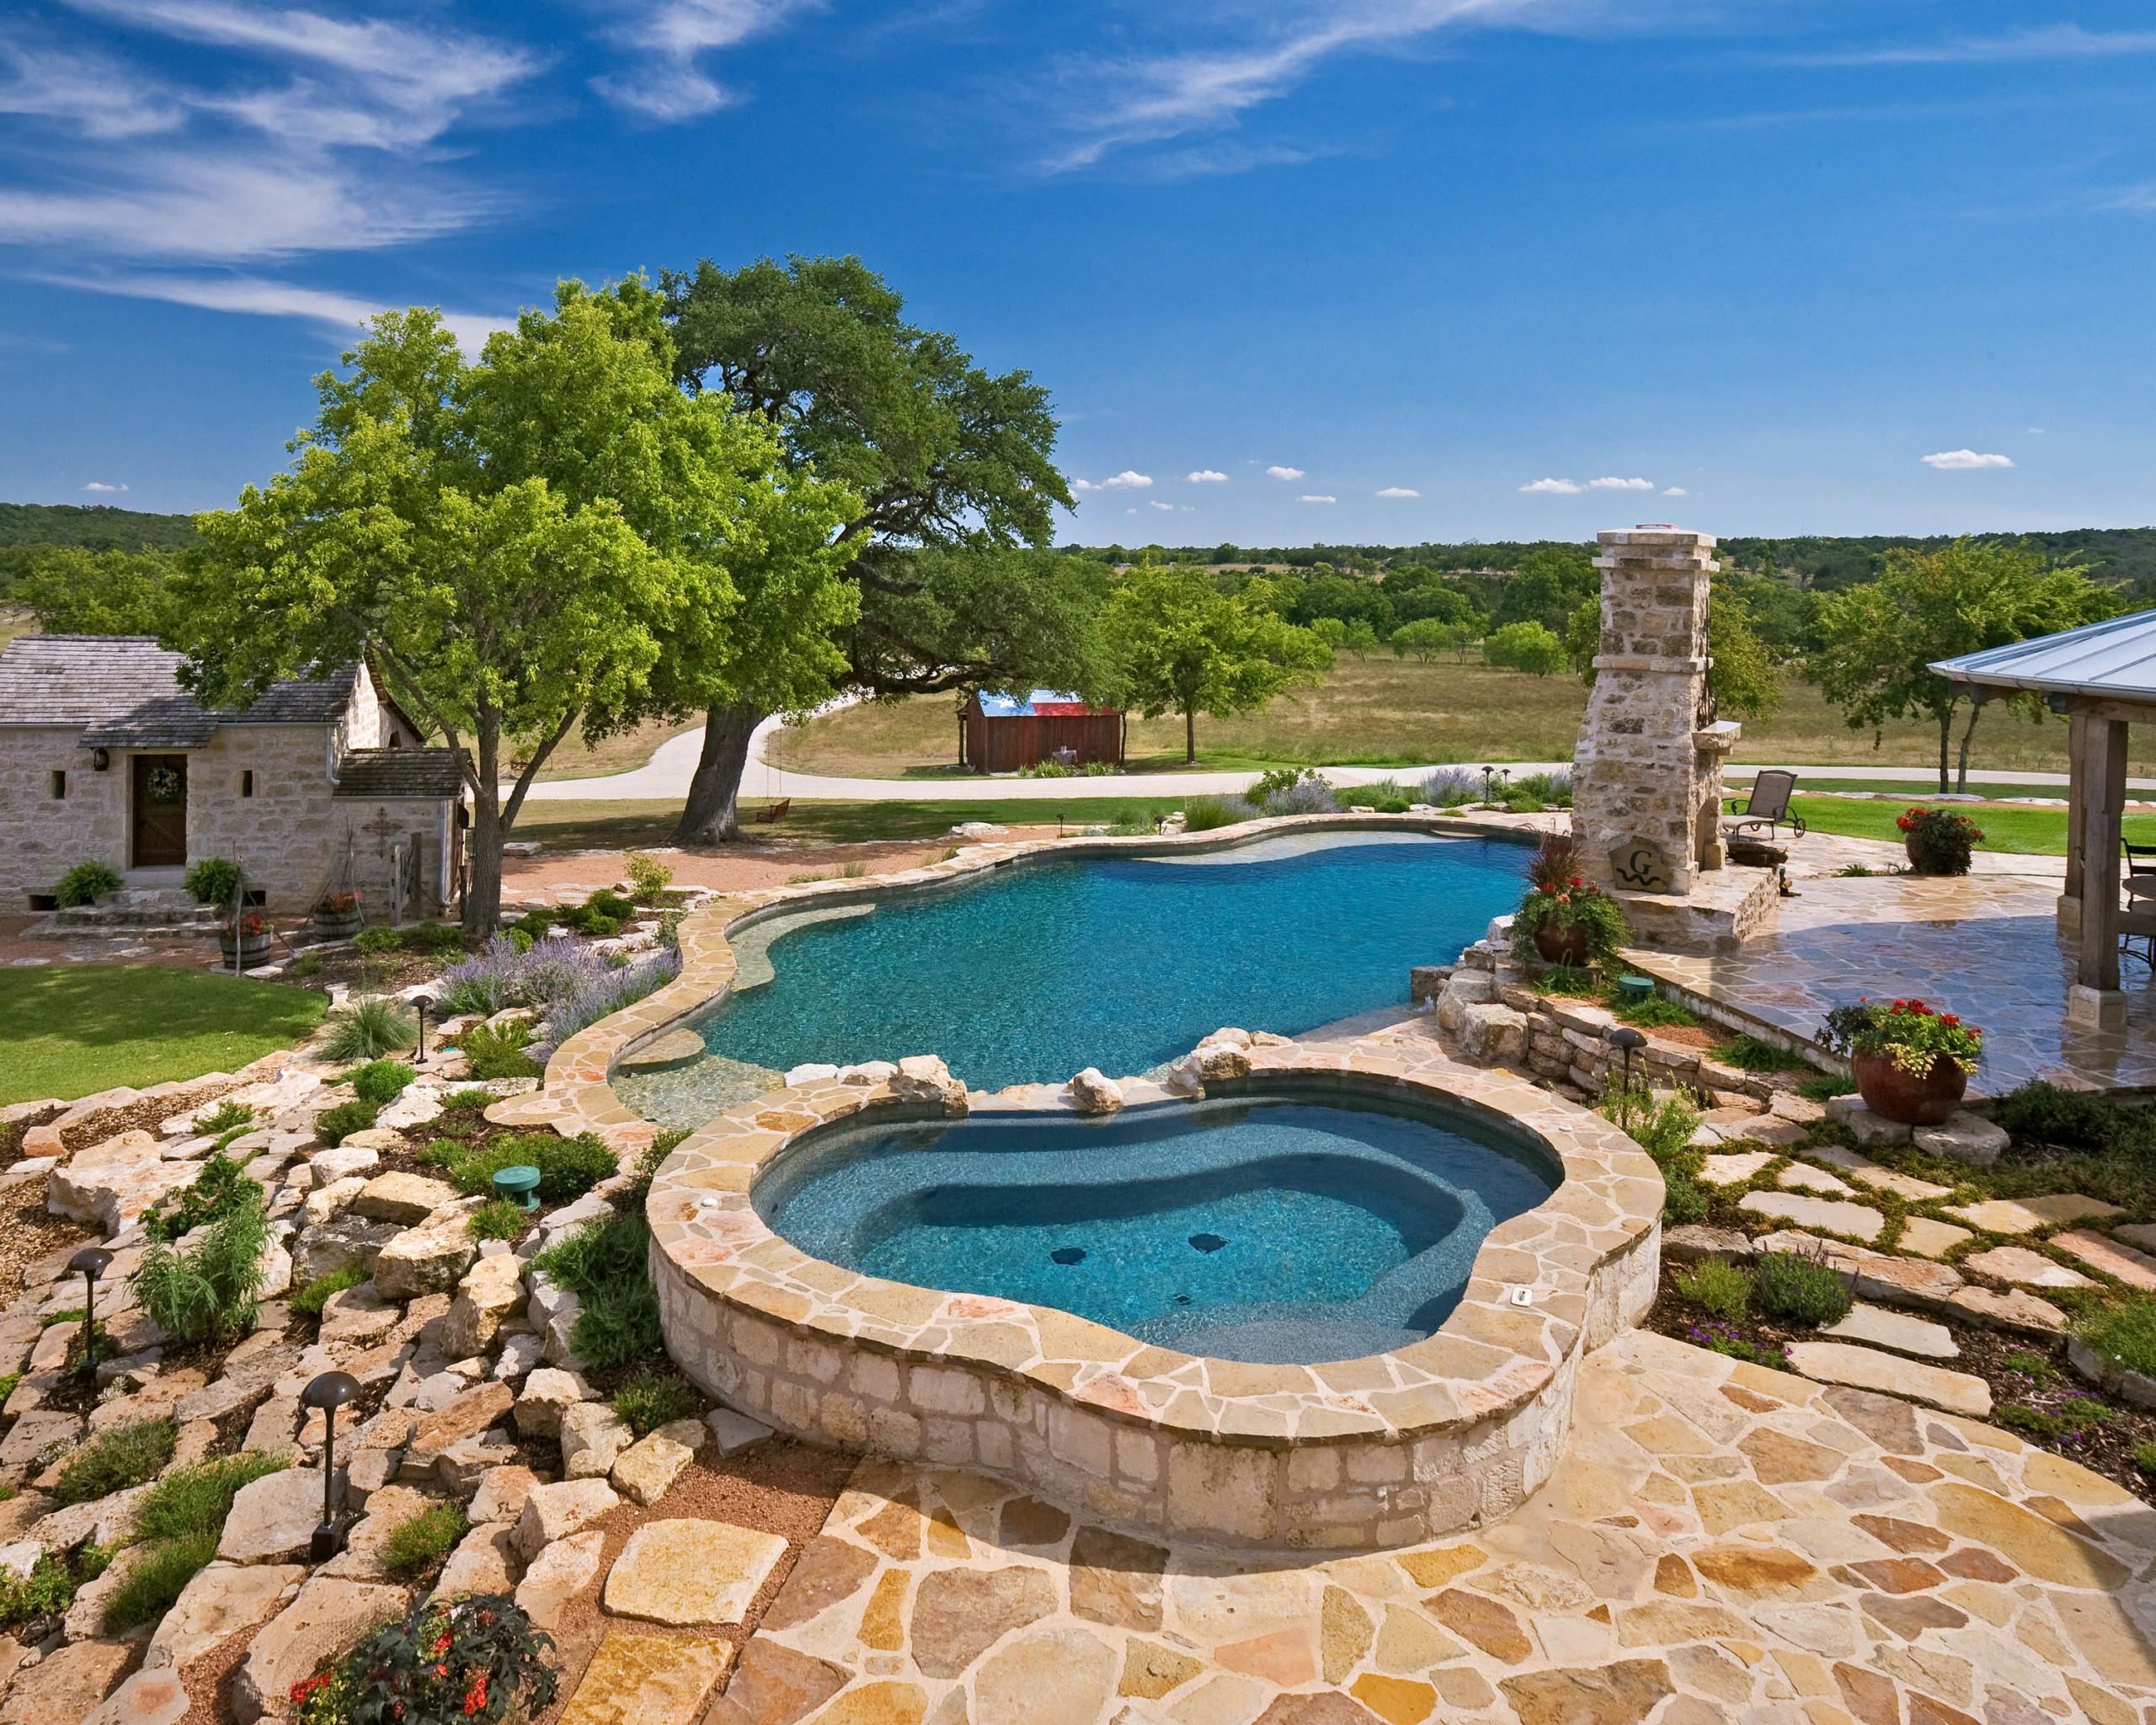 Fredericksburg/Grapetown Texas Ranch Pool/Spa/Waterfall